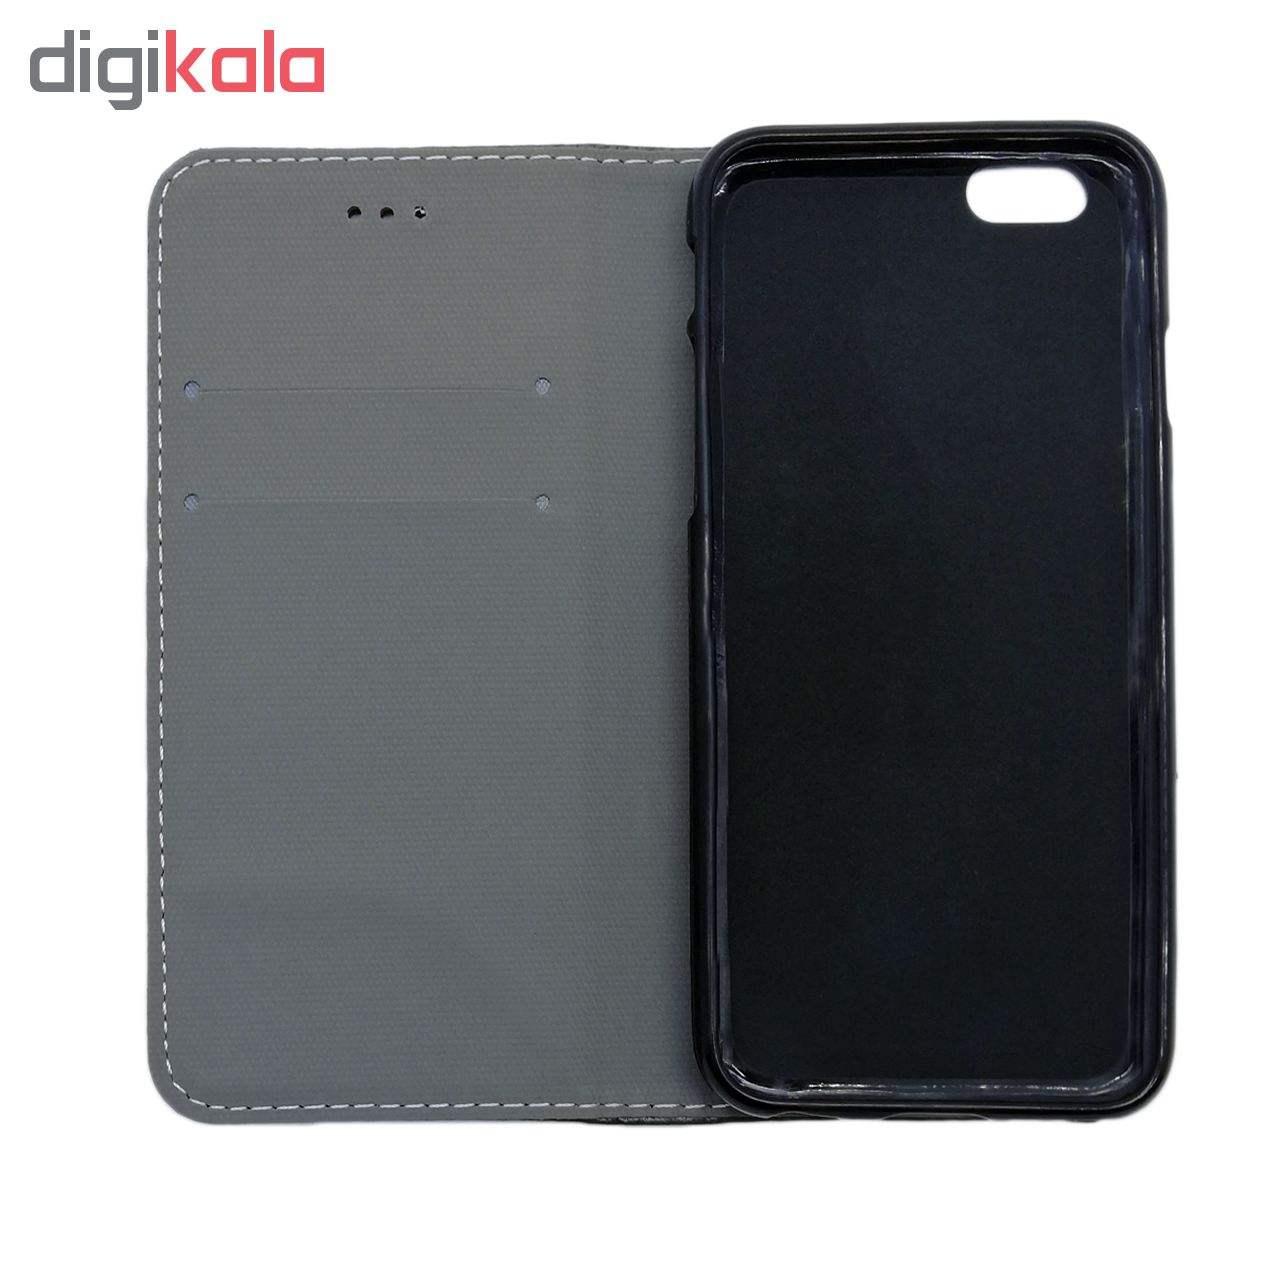 کیف کلاسوری مدل A2 مناسب برای گوشی موبایل اپل iphone 7/8 main 1 4